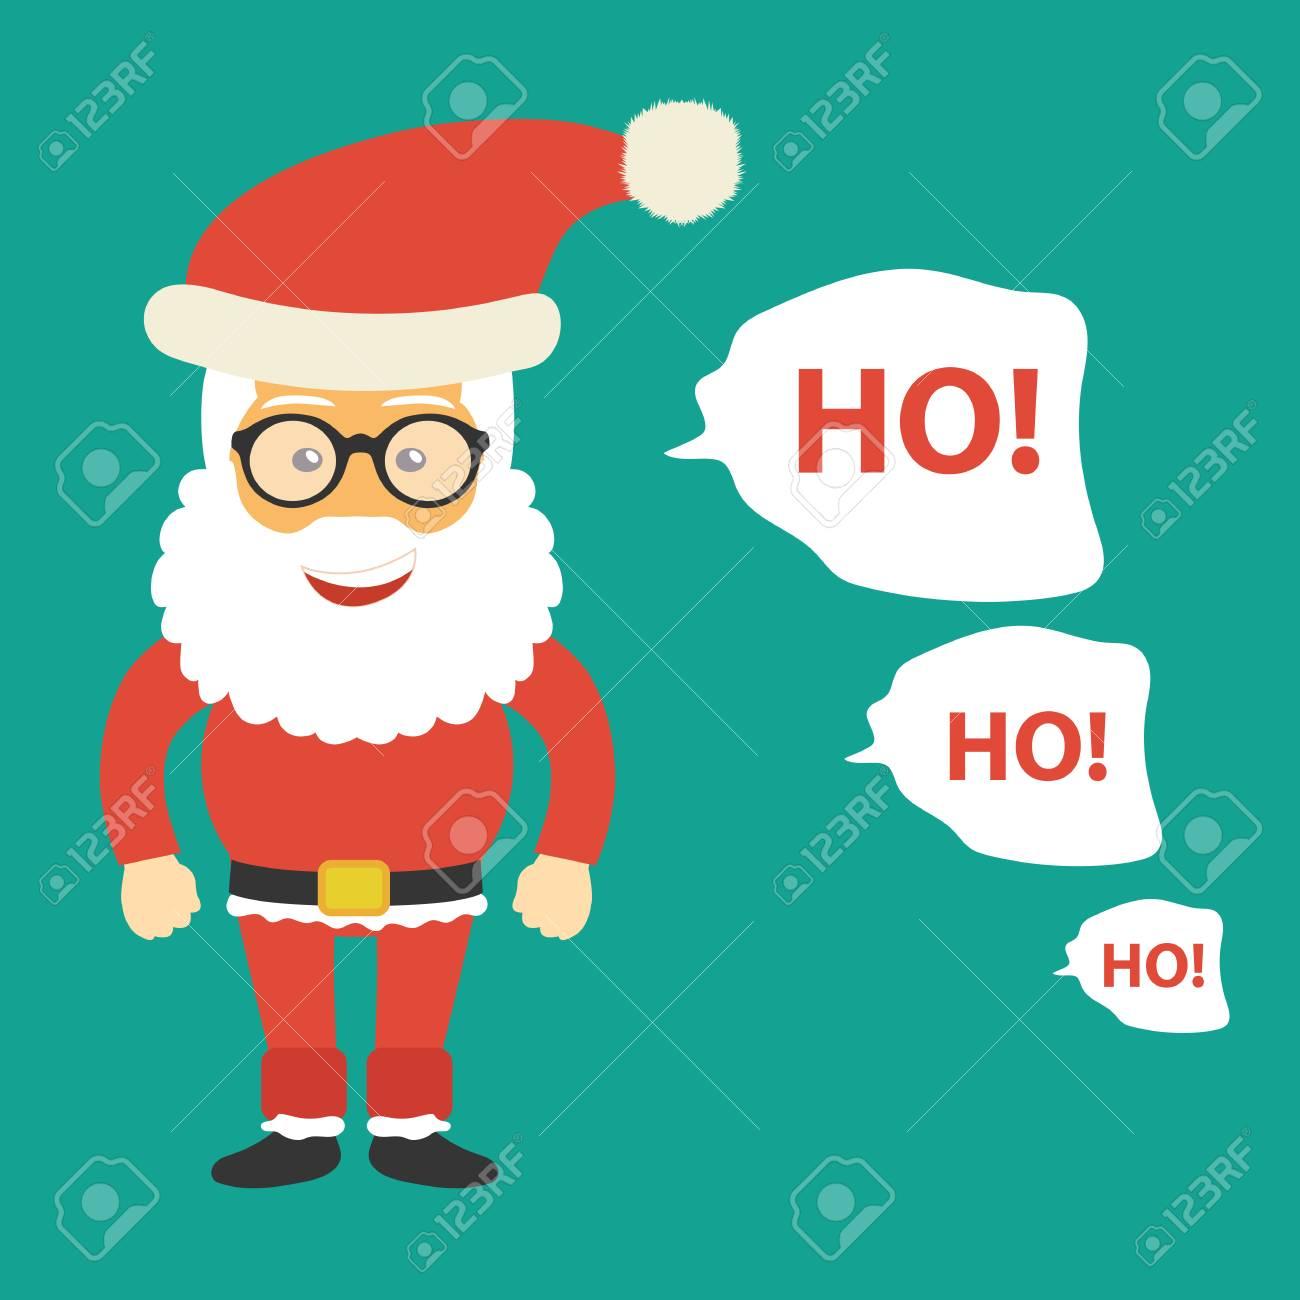 Santa Claus Icon. Ho Ho Ho Text Next To Santa. Christmas Card ...